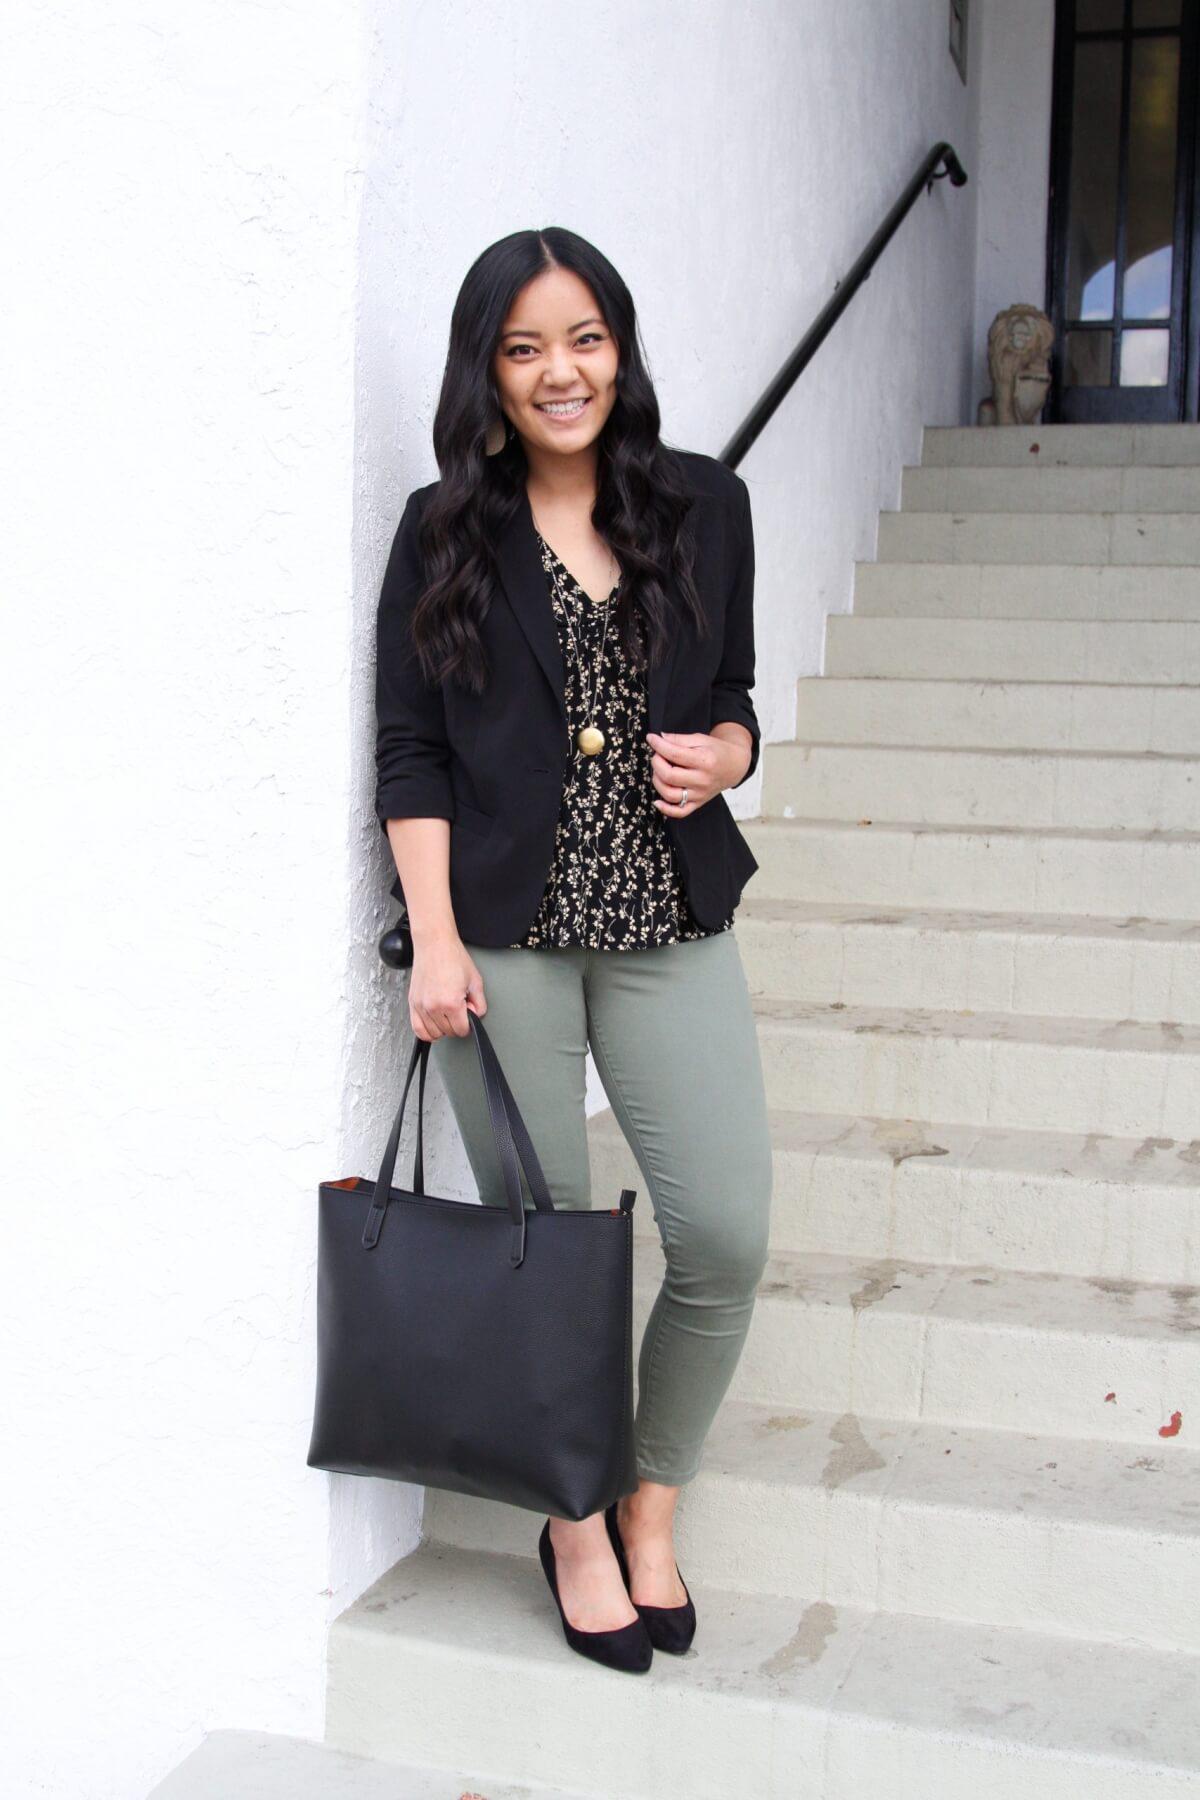 Work Outfit: black Eliza blazer + black and ivory floral top + olive pants + black pumps + pendant necklace + black tote